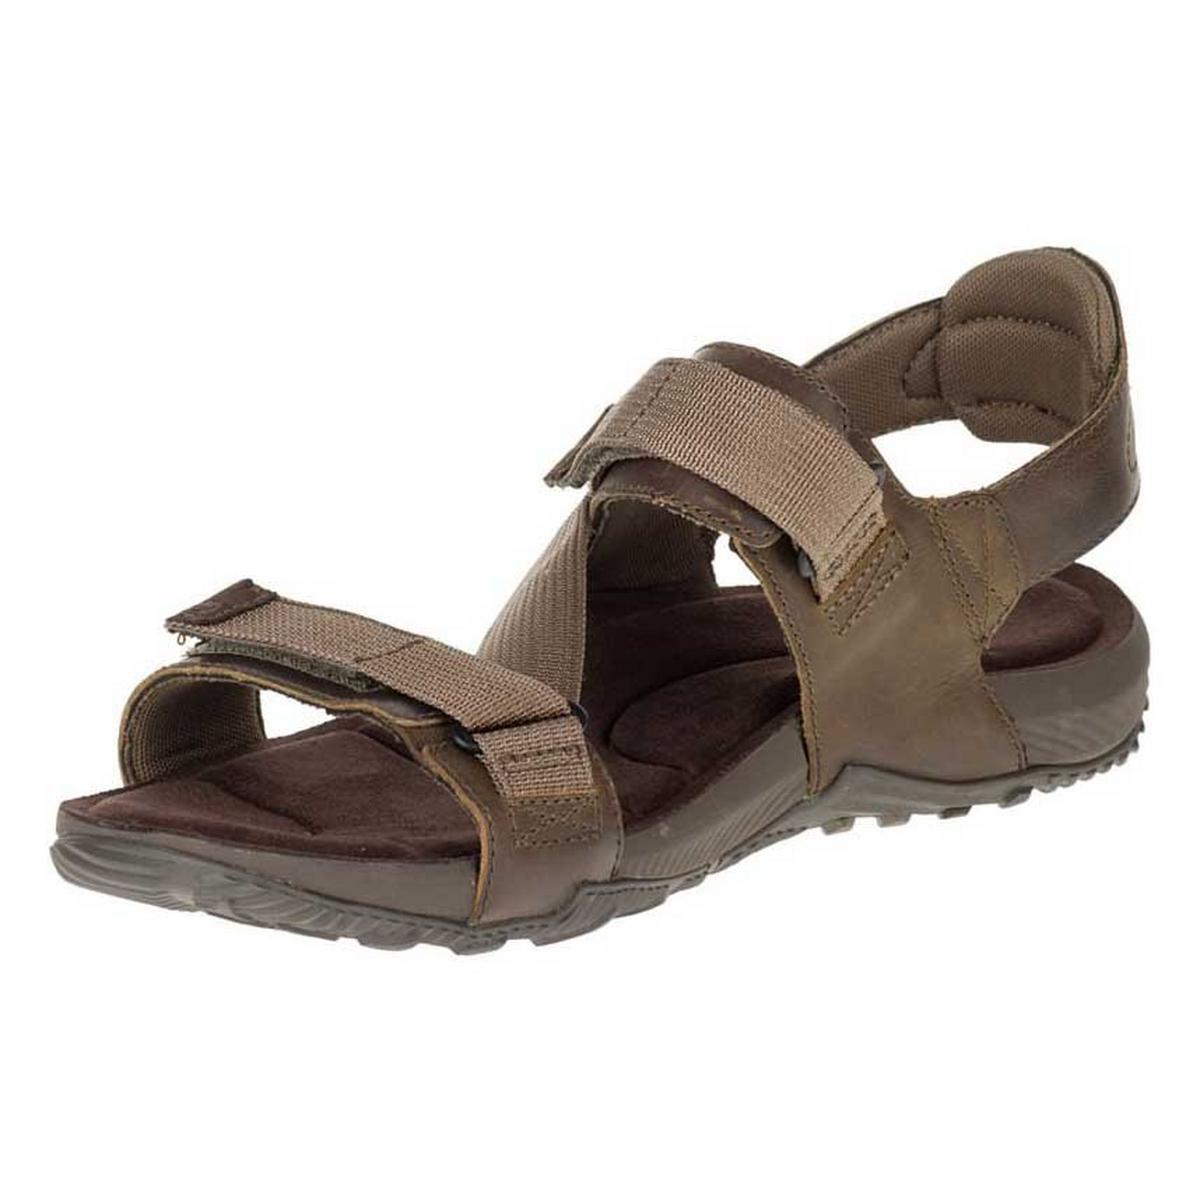 Merrell Men's Terrant Strap Sandals